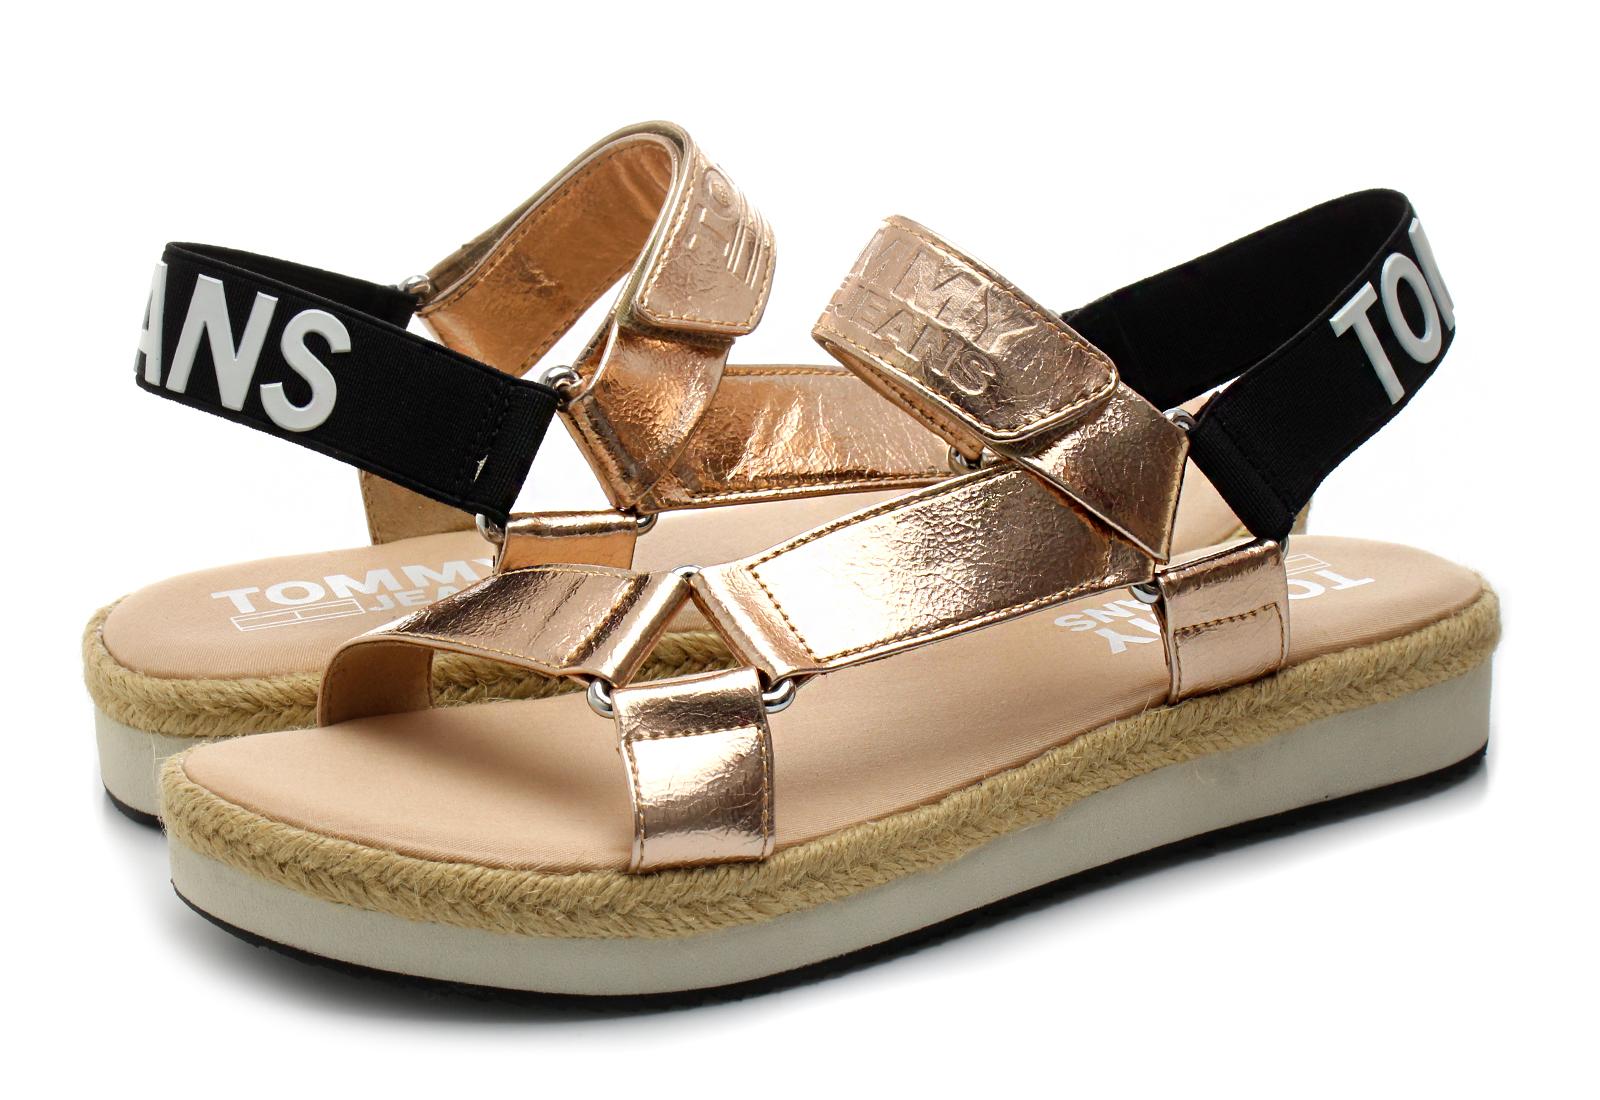 Tommy Hilfiger Szandál - Sofia 2 - 18S-0218-638 - Office Shoes ... f5725beb4b